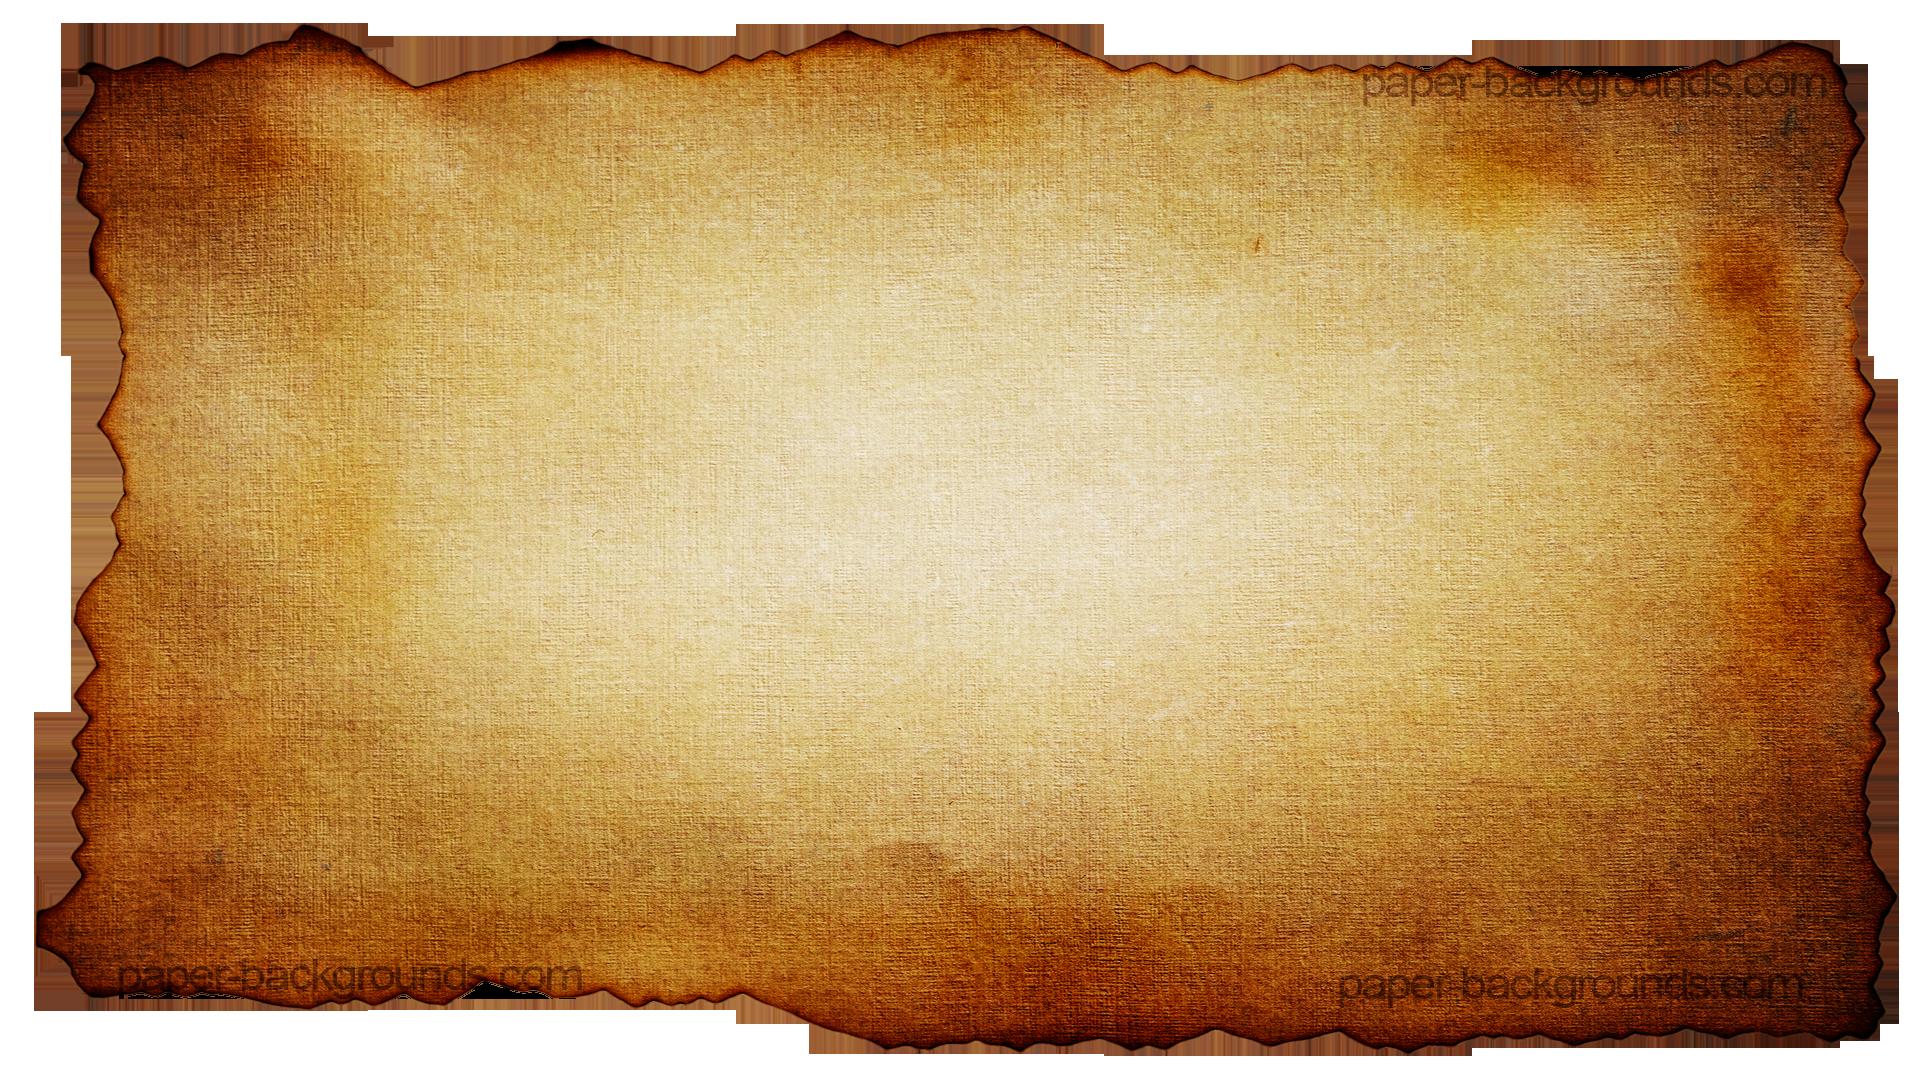 Paper Backgrounds | old-burned-vintage-paper-texture-hd